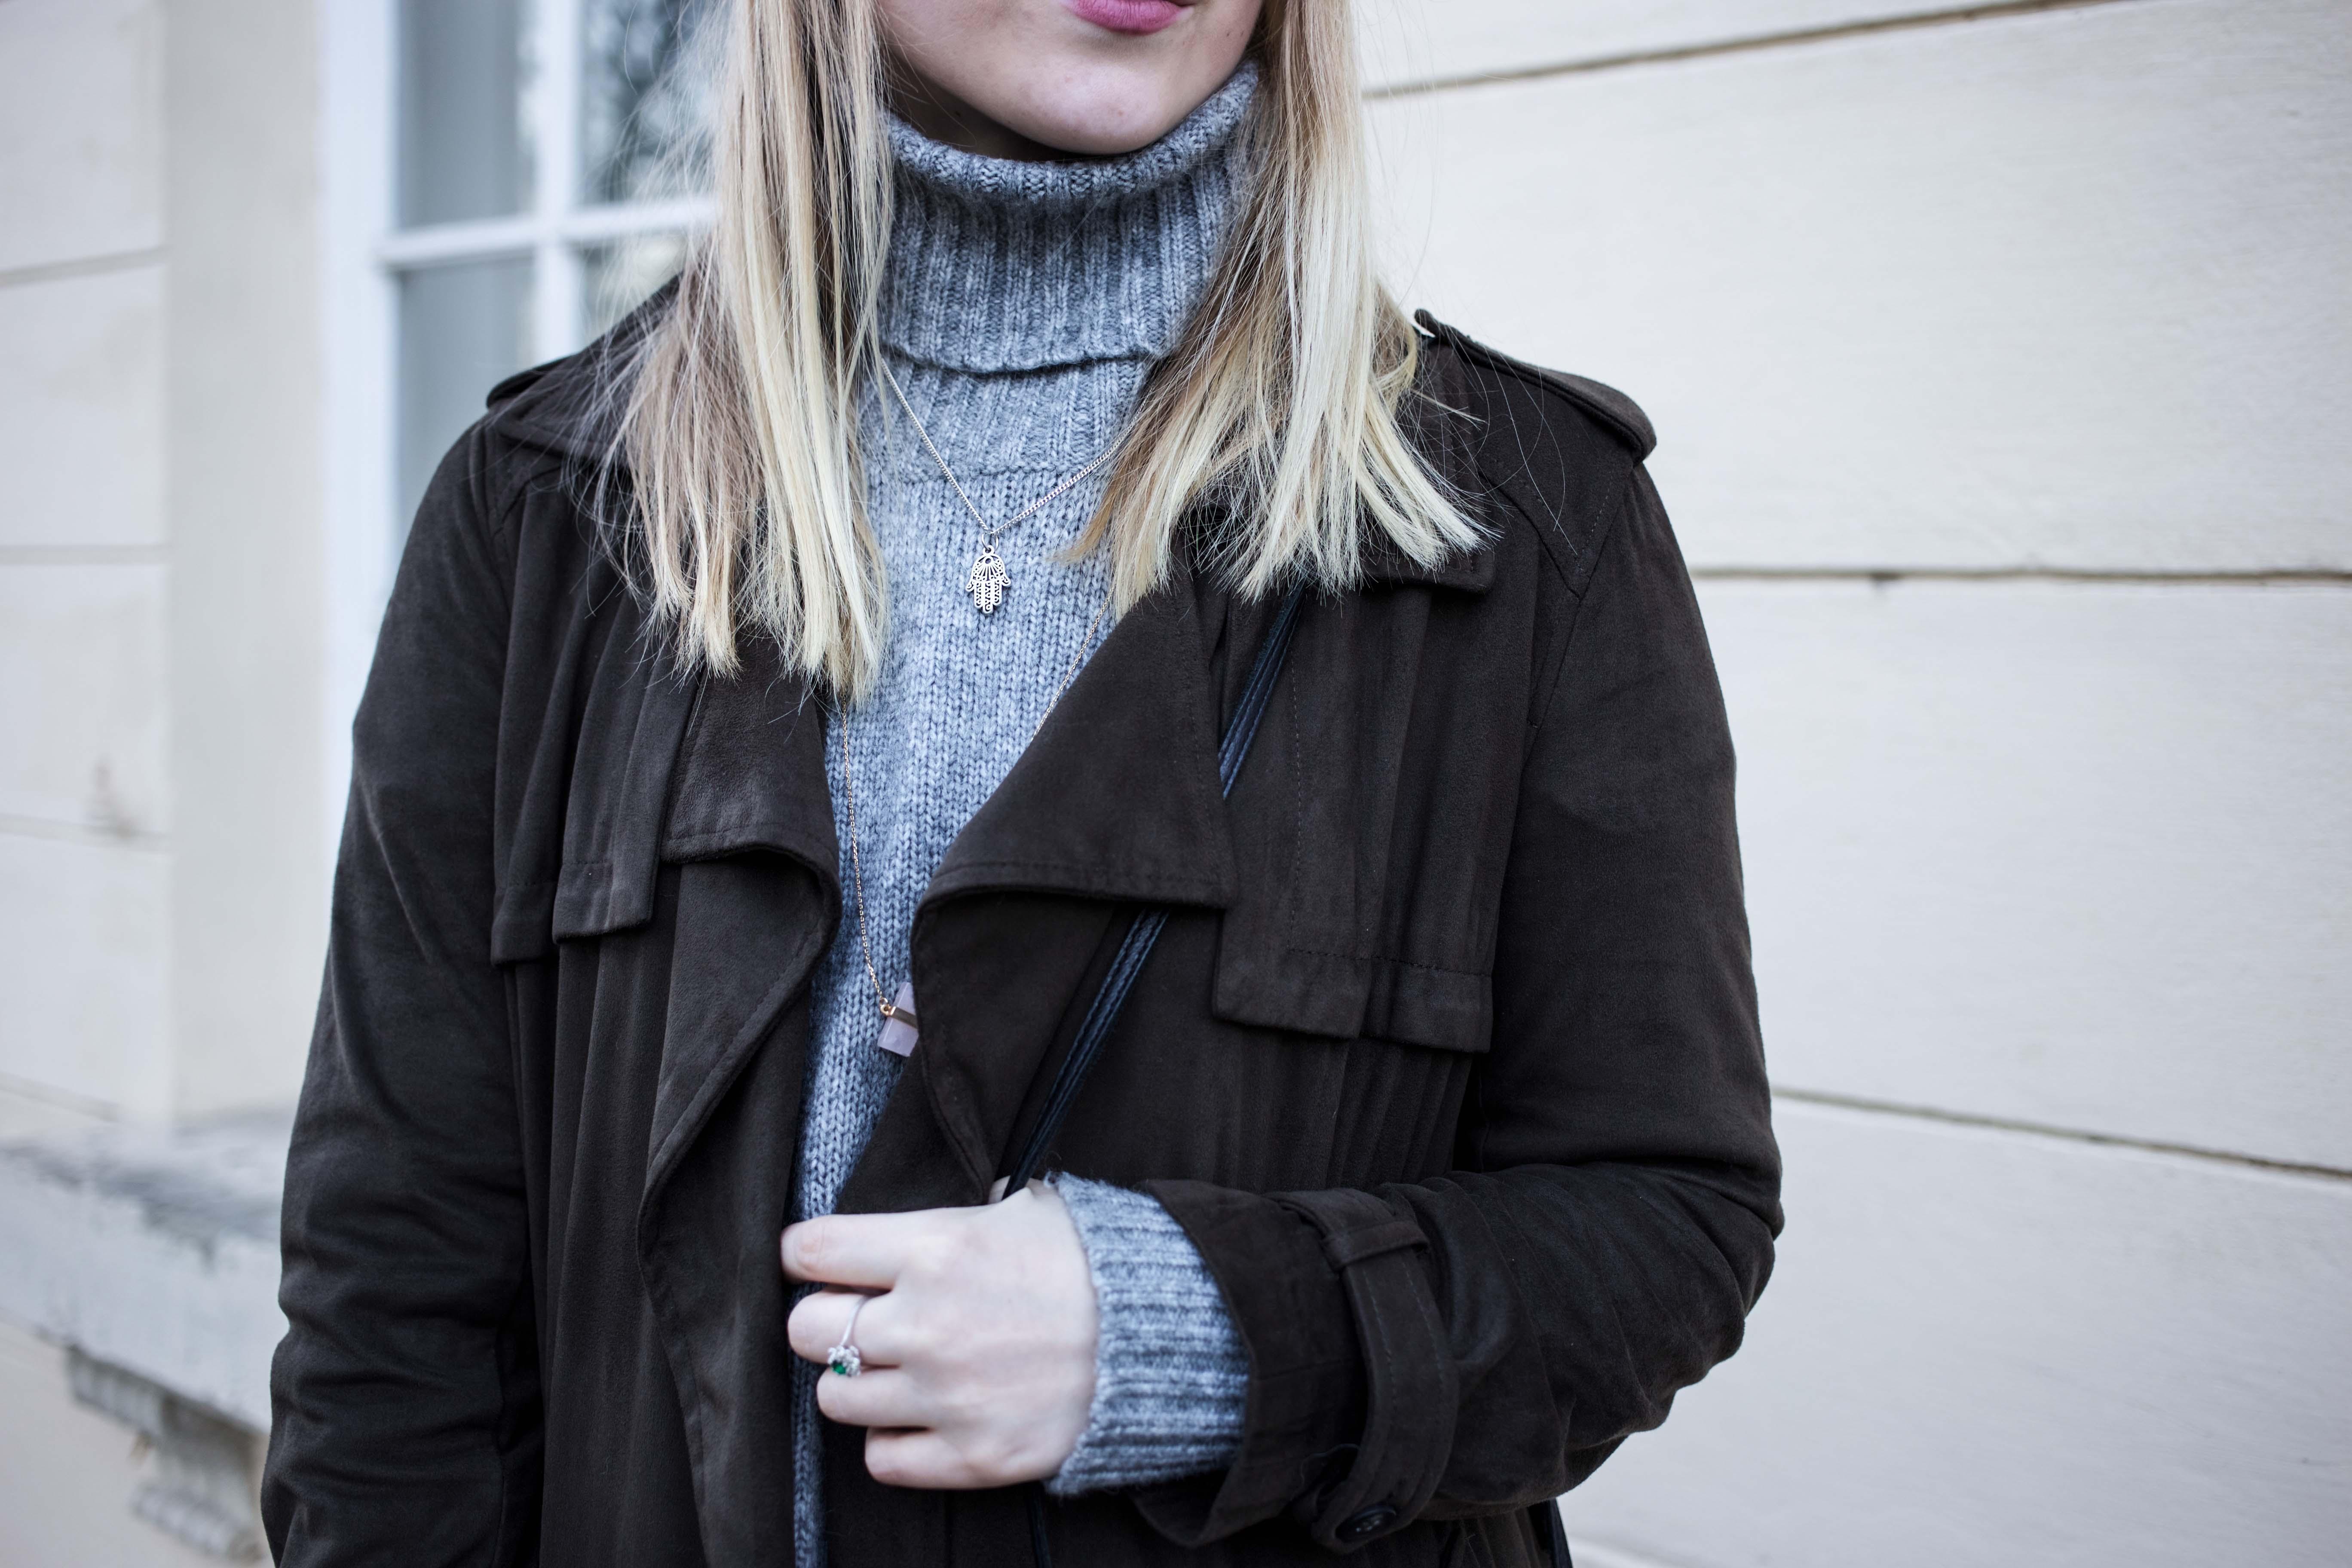 turtleneck-trench-coat-streetstyle-modeblog-fashionblog-bonn-berlin-köln-lederstiefel-silberabsatz-outfi_9233